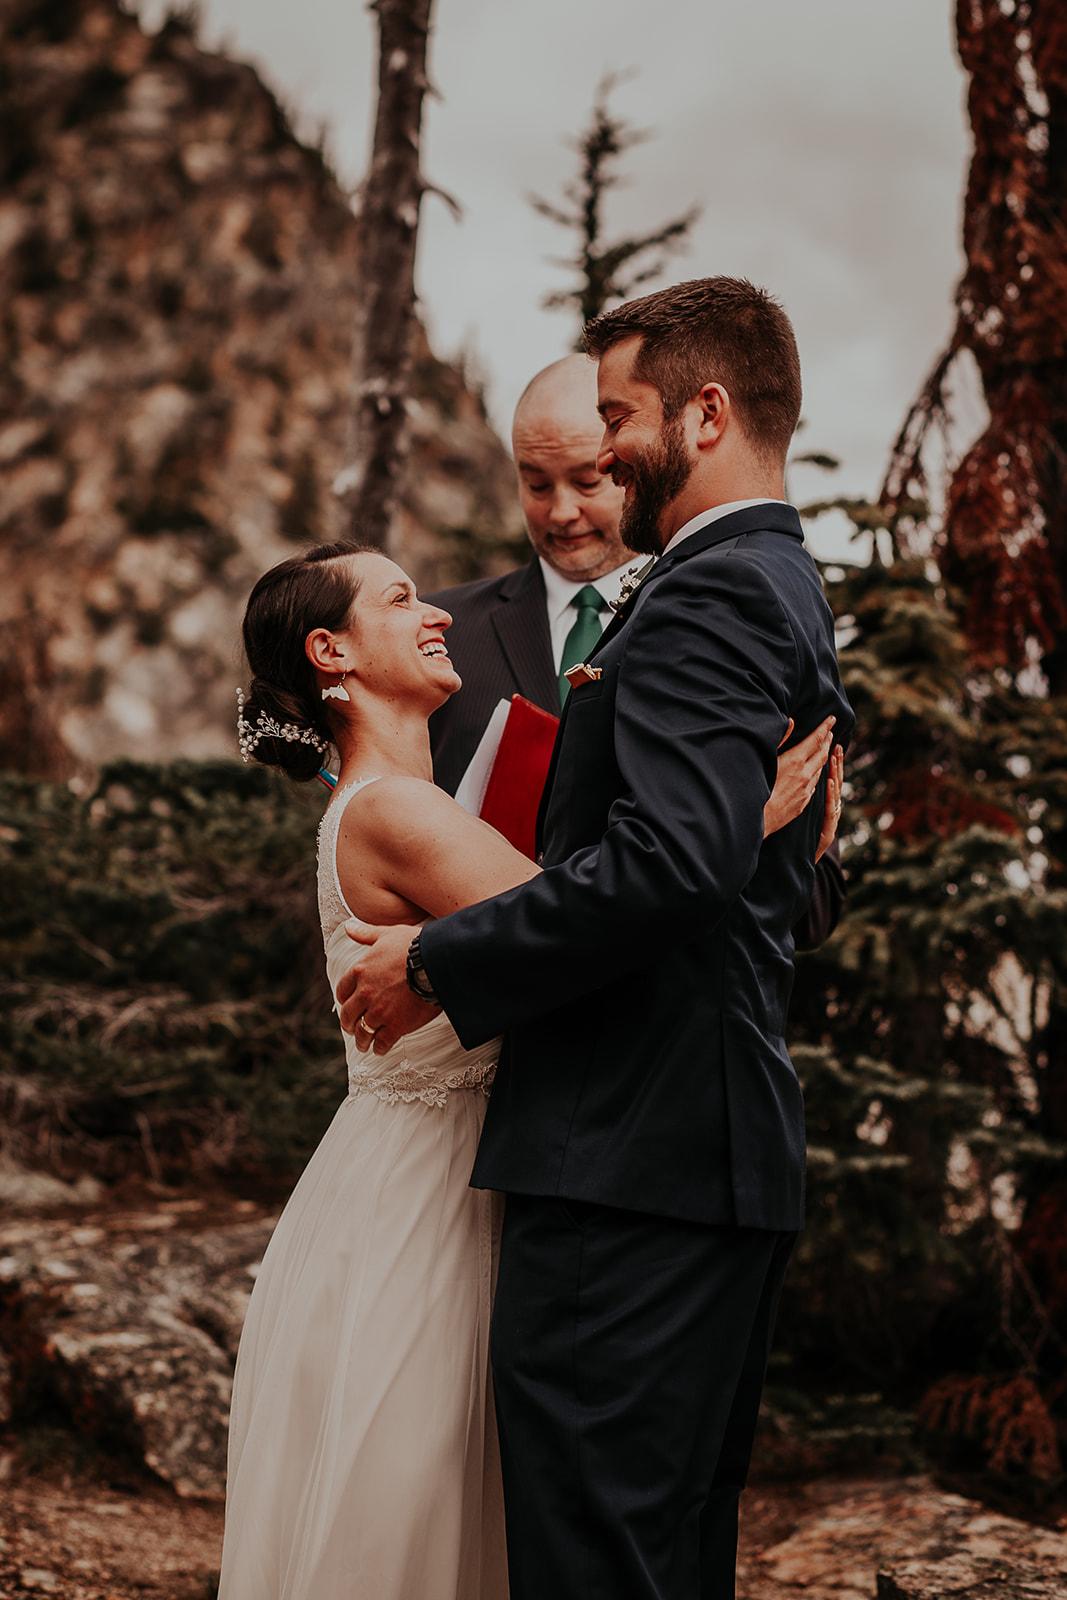 winthrop-wedding-photographer-megan-gallagher-photography (23).jpg